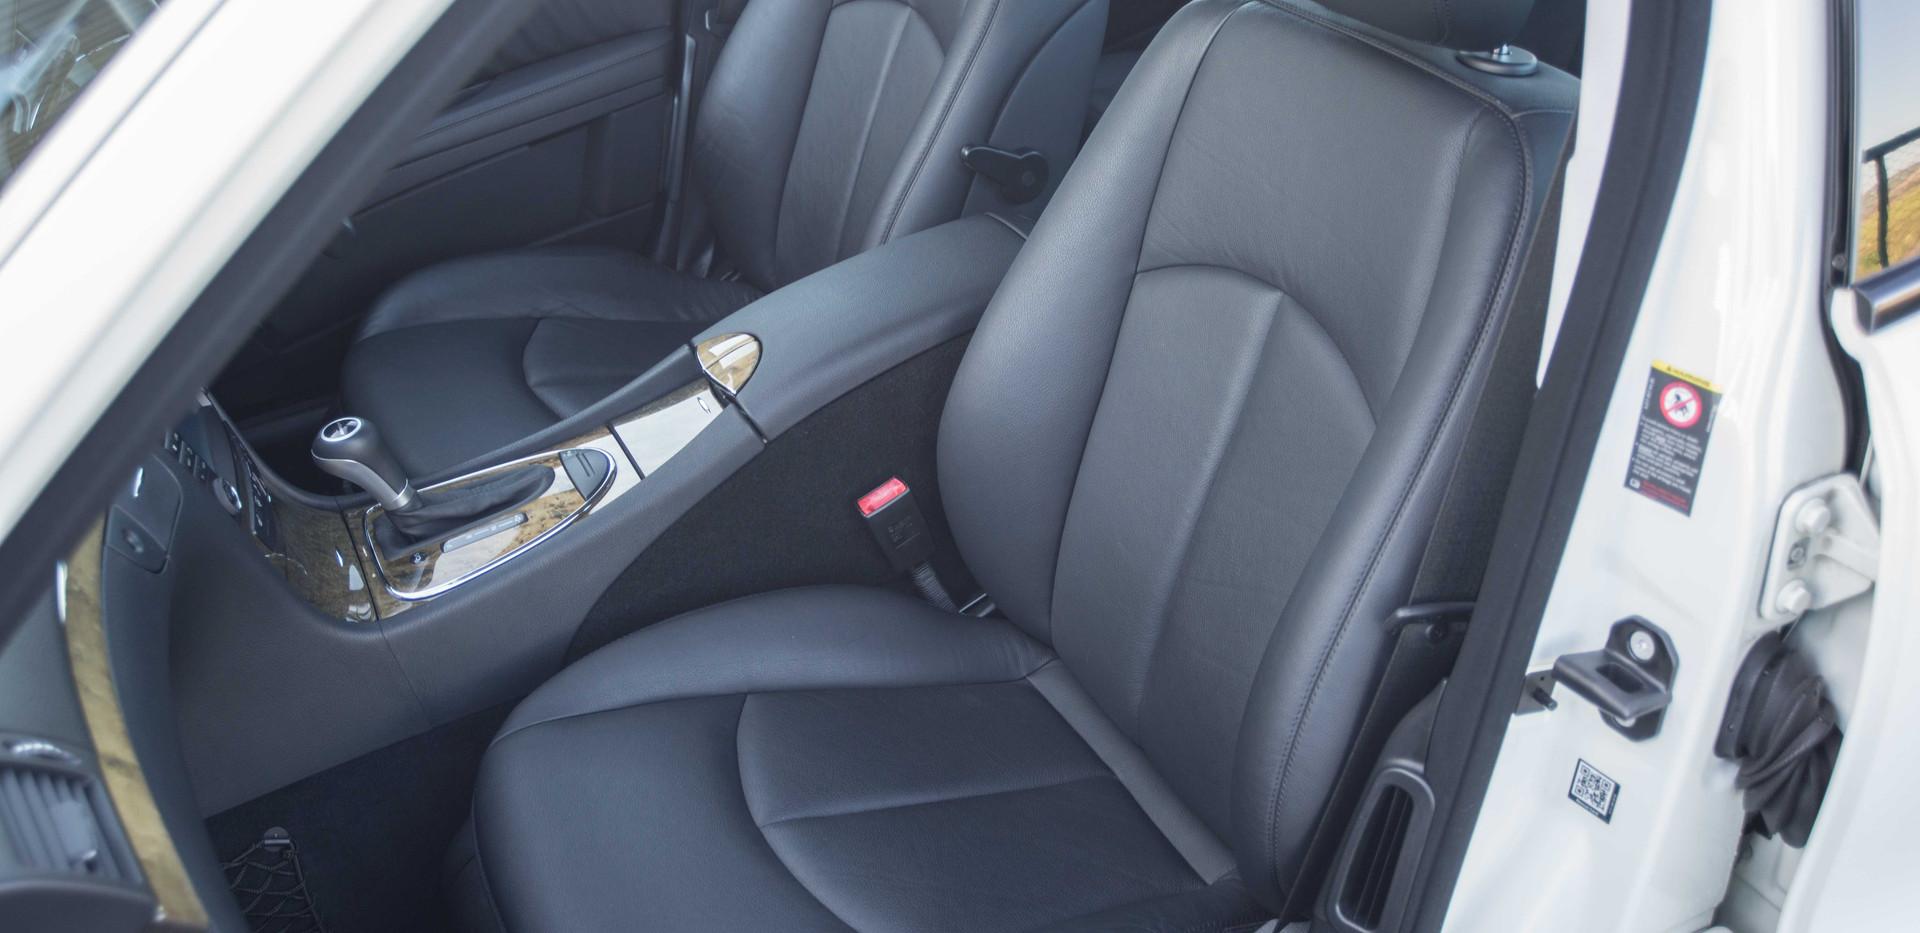 Mercedes E350 For Sale UK London  (54 of